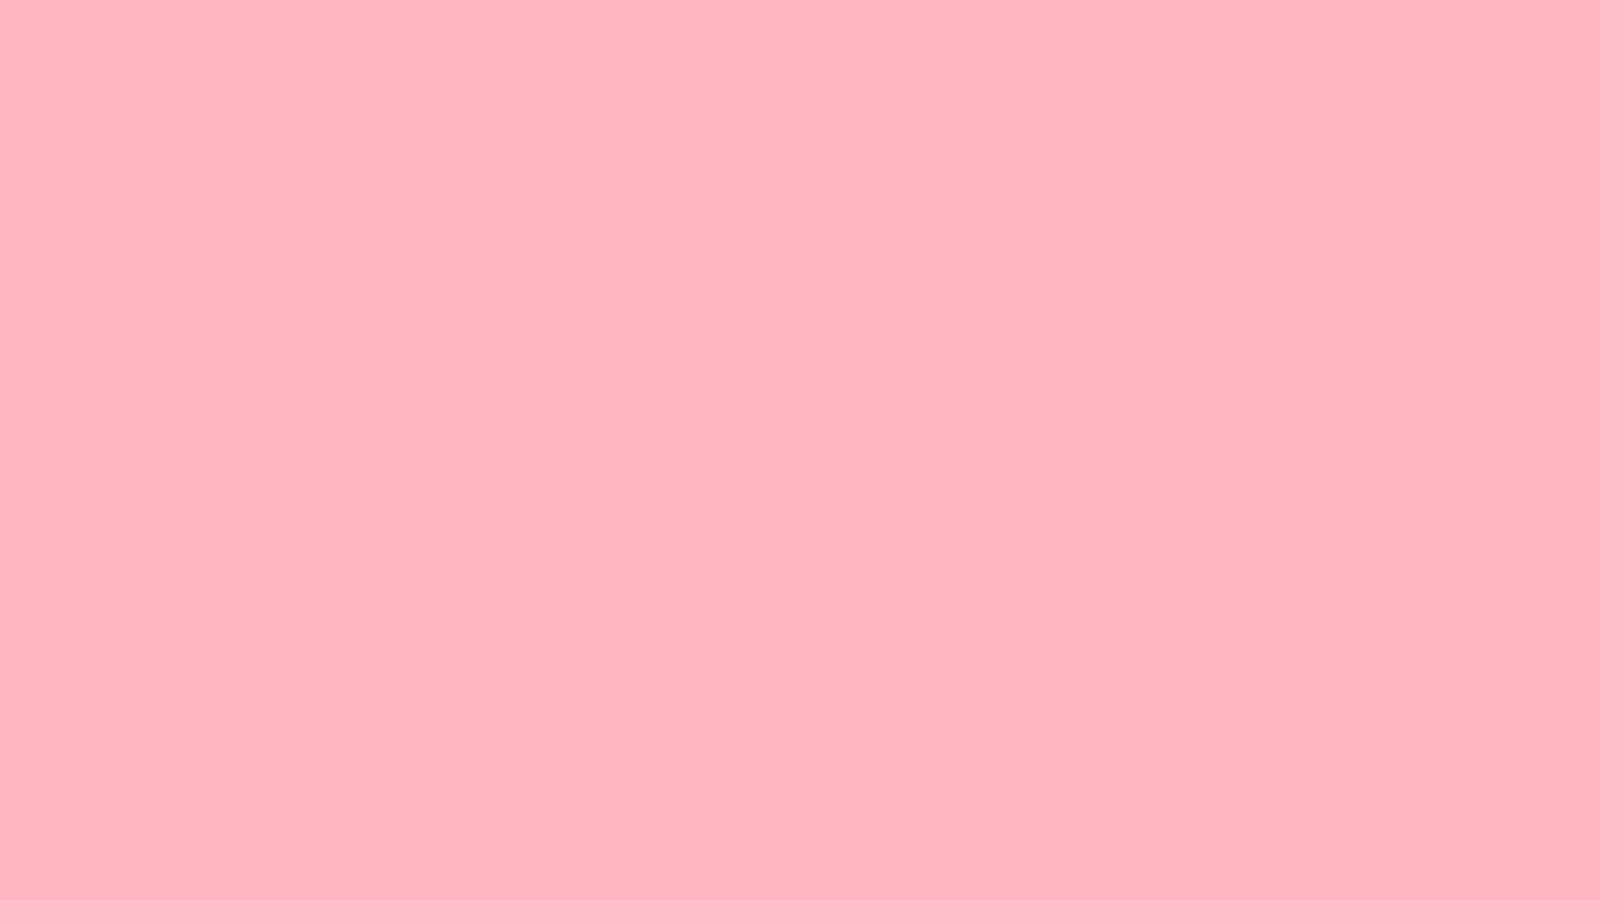 Light Pink Background Hd HD Wallpapers on picsfaircom 1600x900